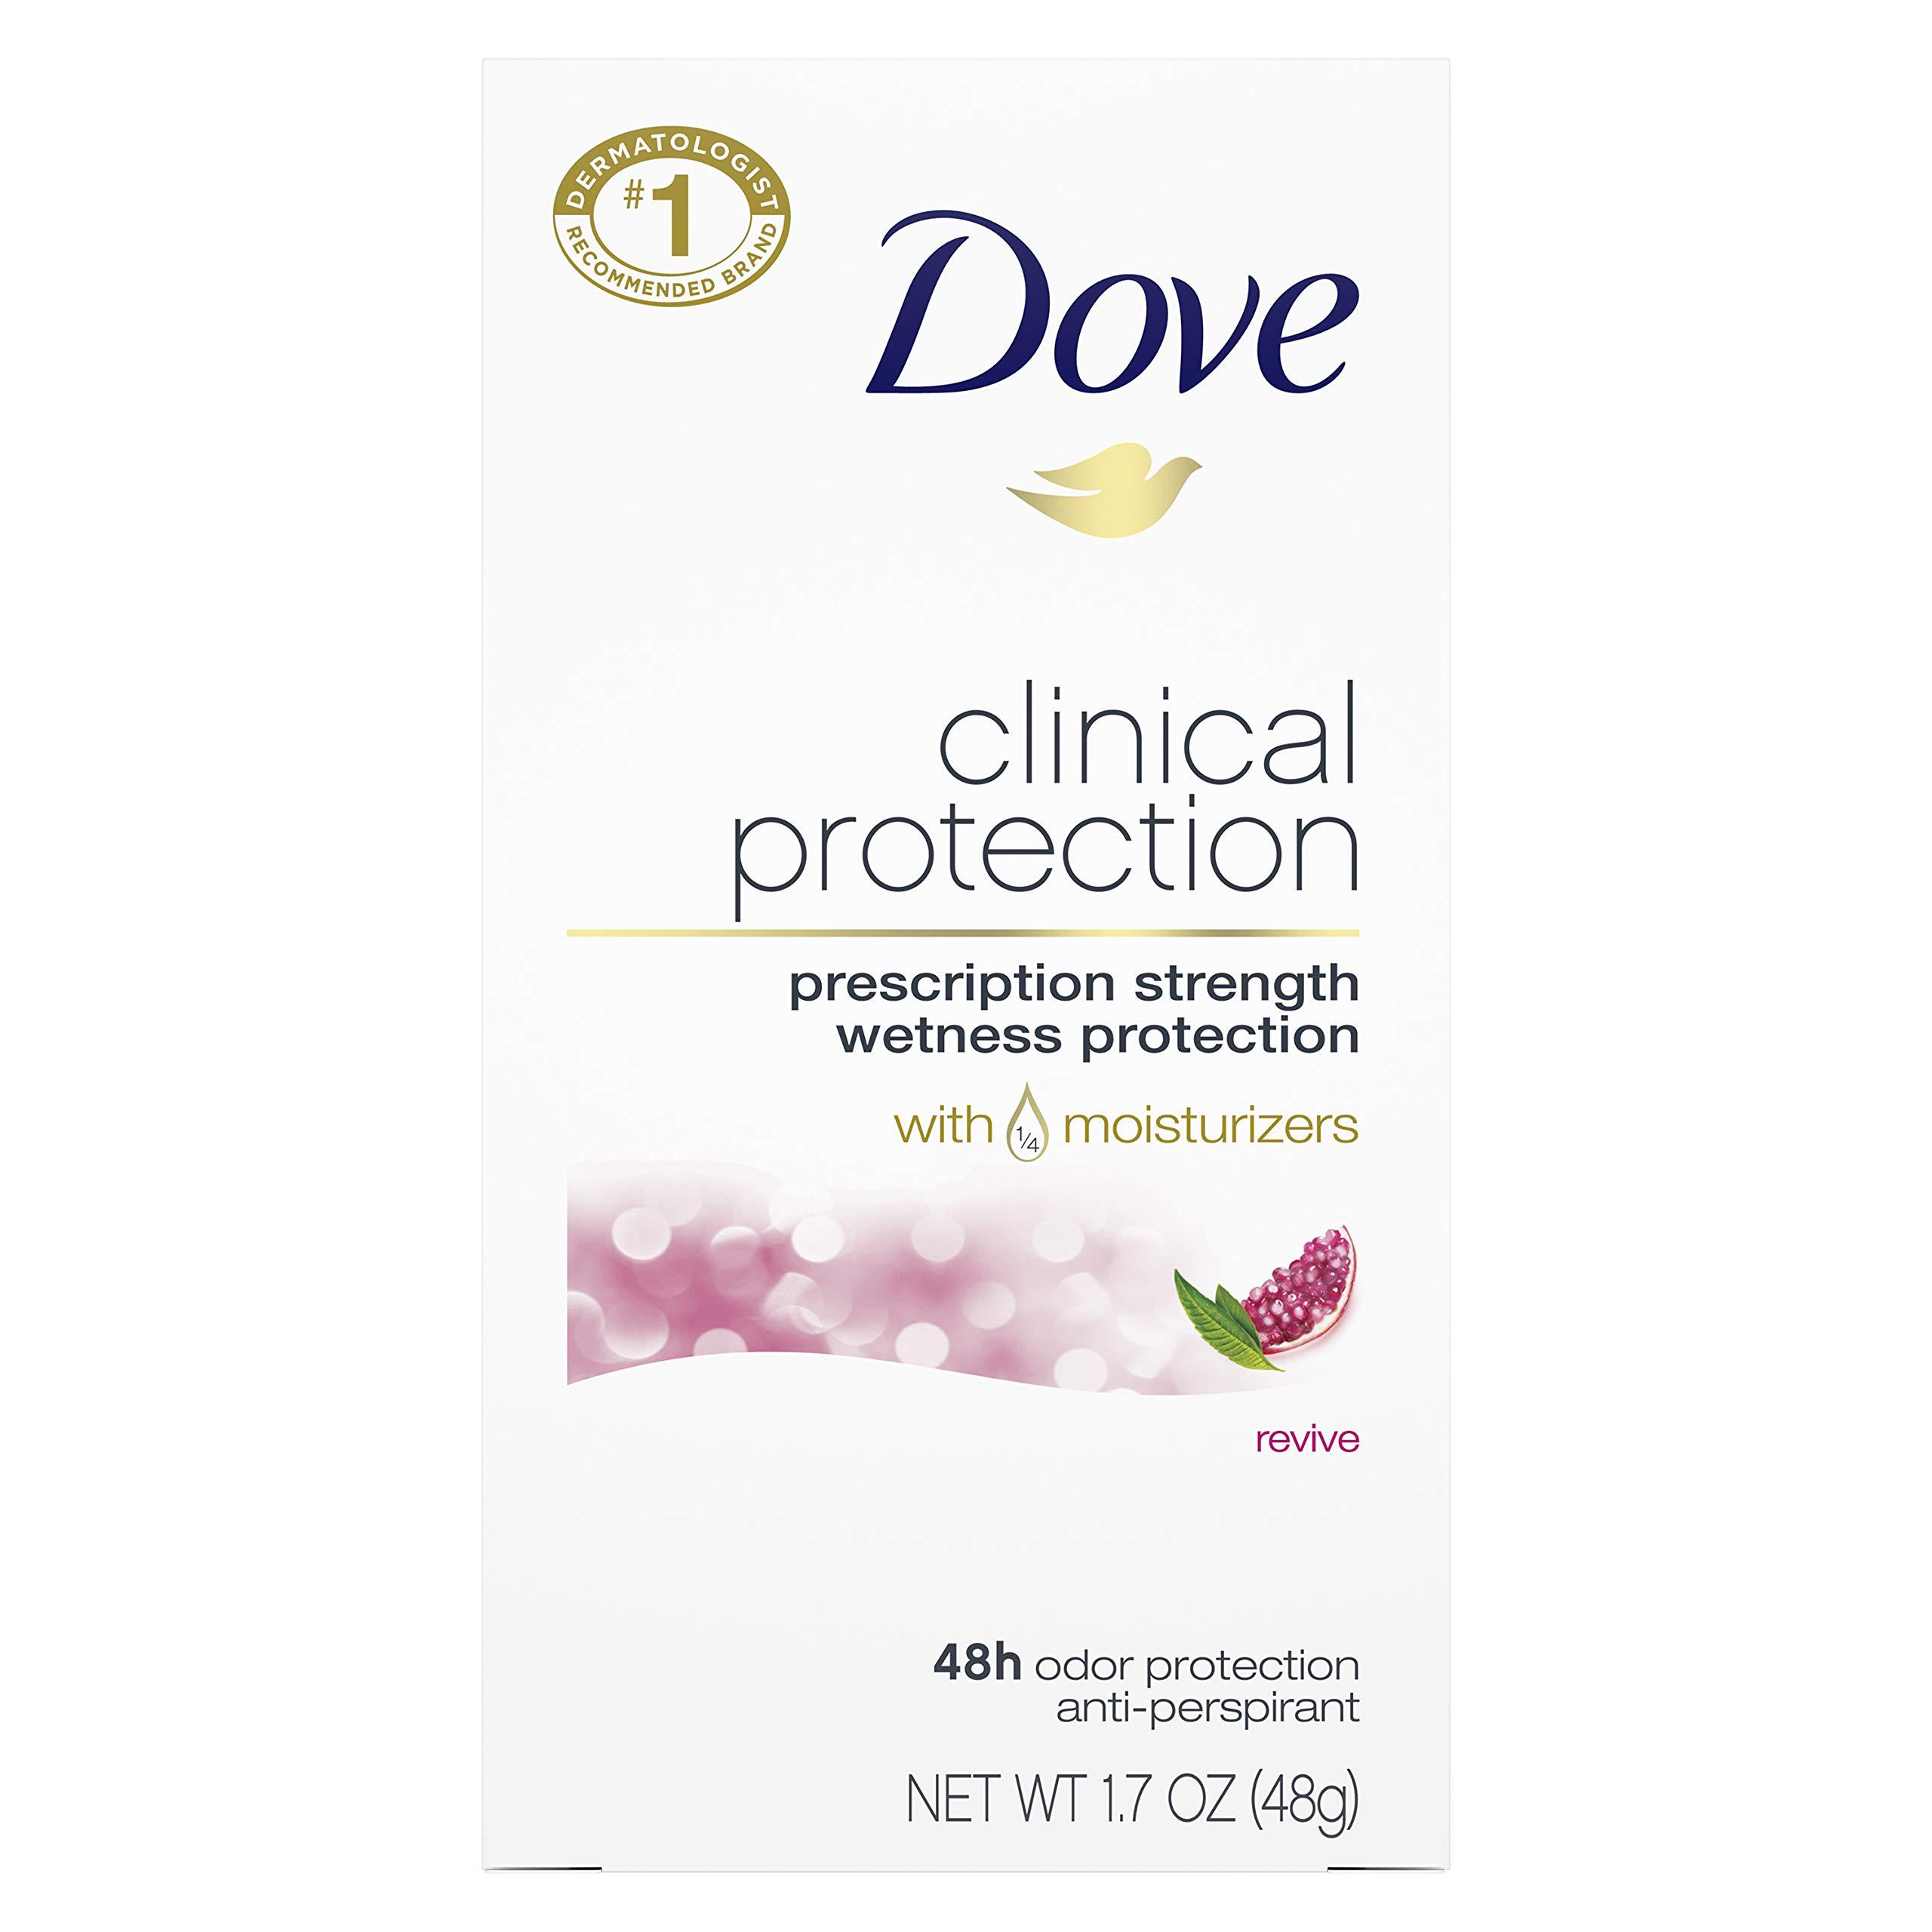 Dove Clinical Protection Antiperspirant Deodorant Revive 1.7 oz